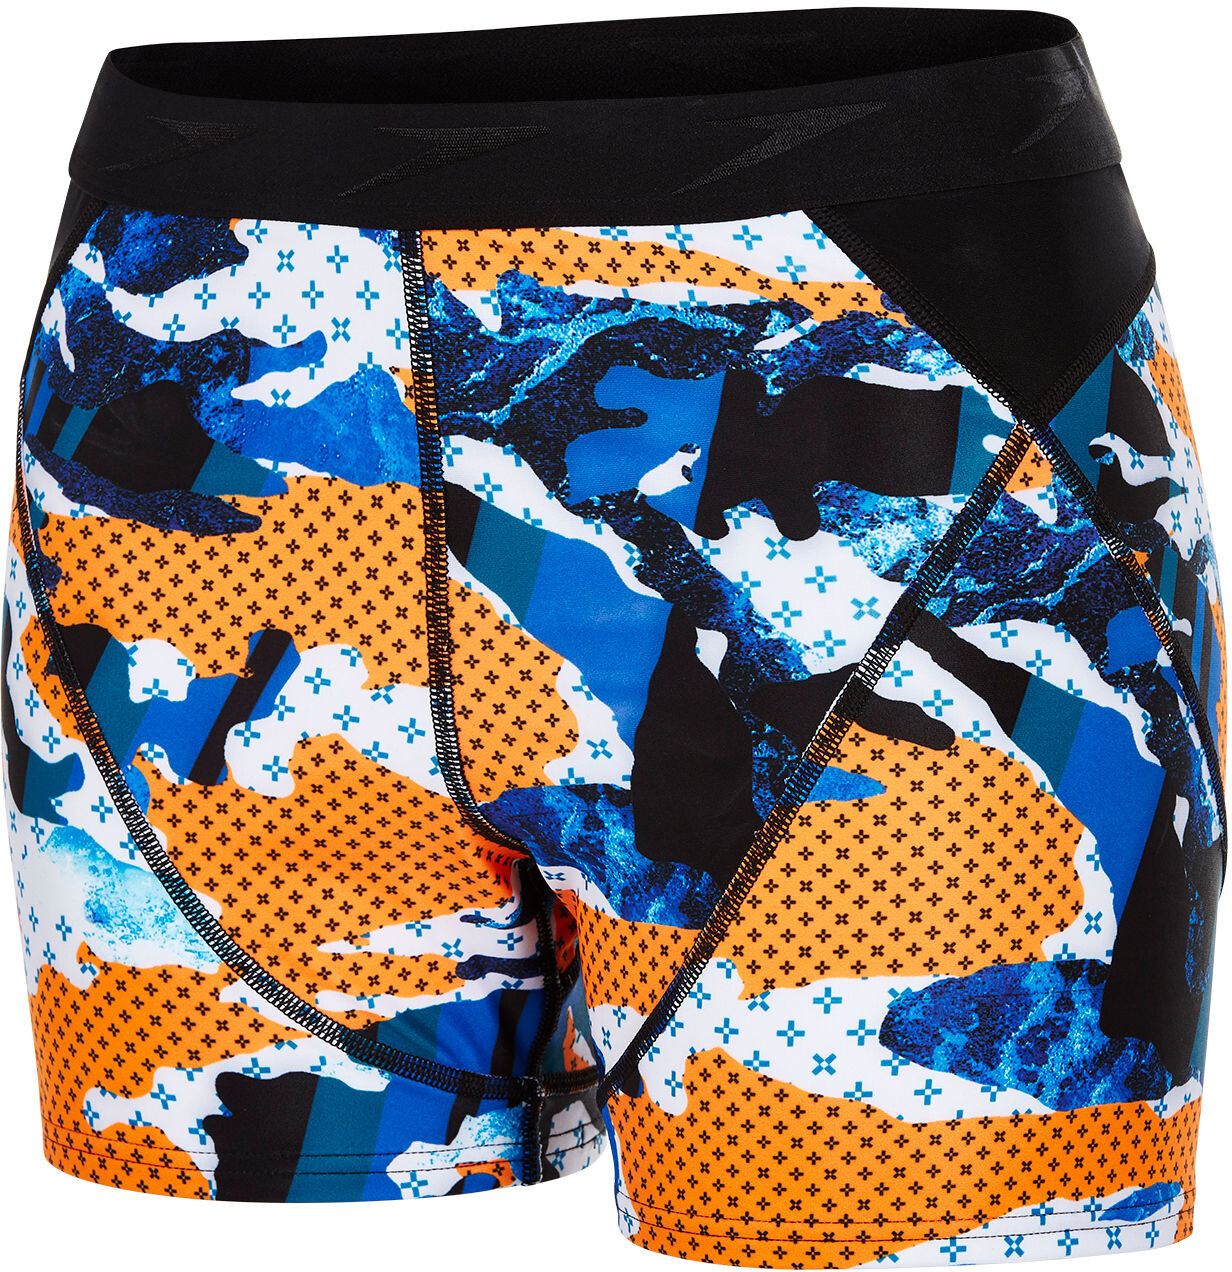 speedo Stormza Sport Brief Women, black/orange | item_misc